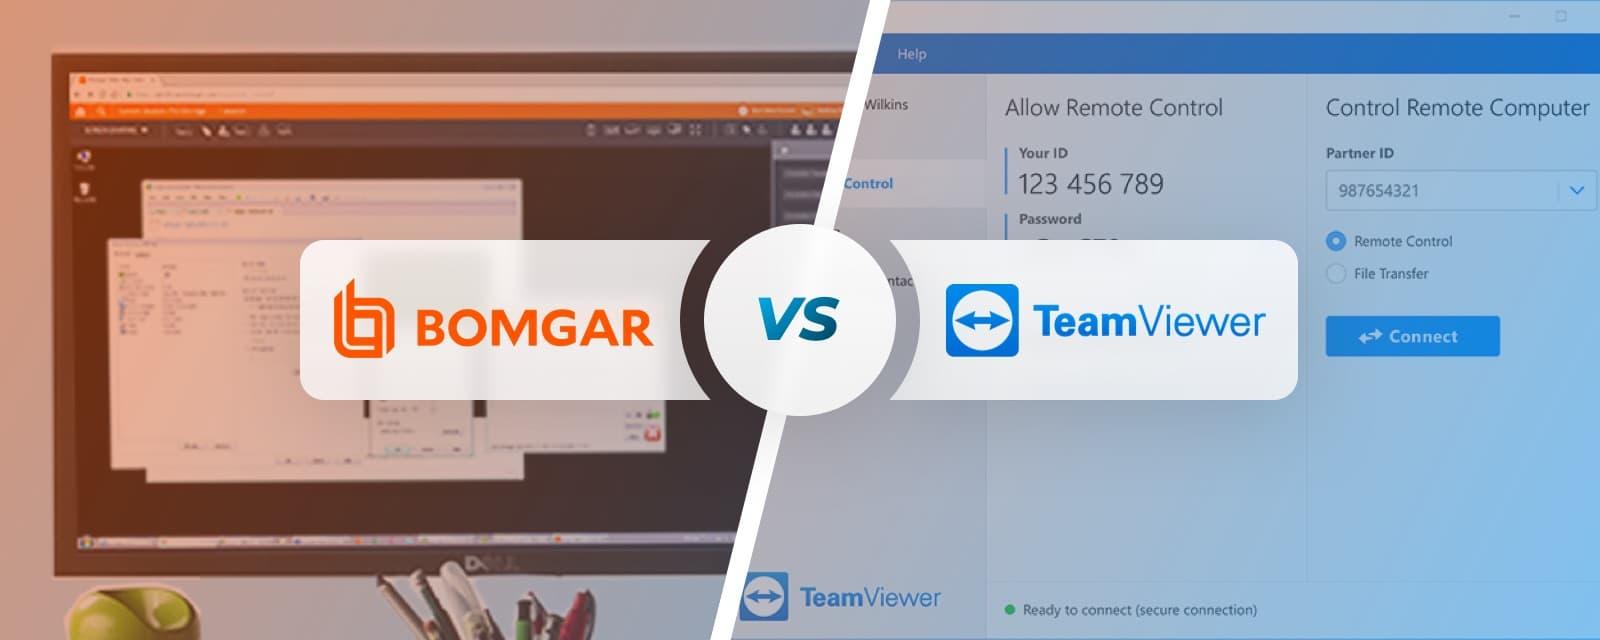 Bomgar vs TeamViewer